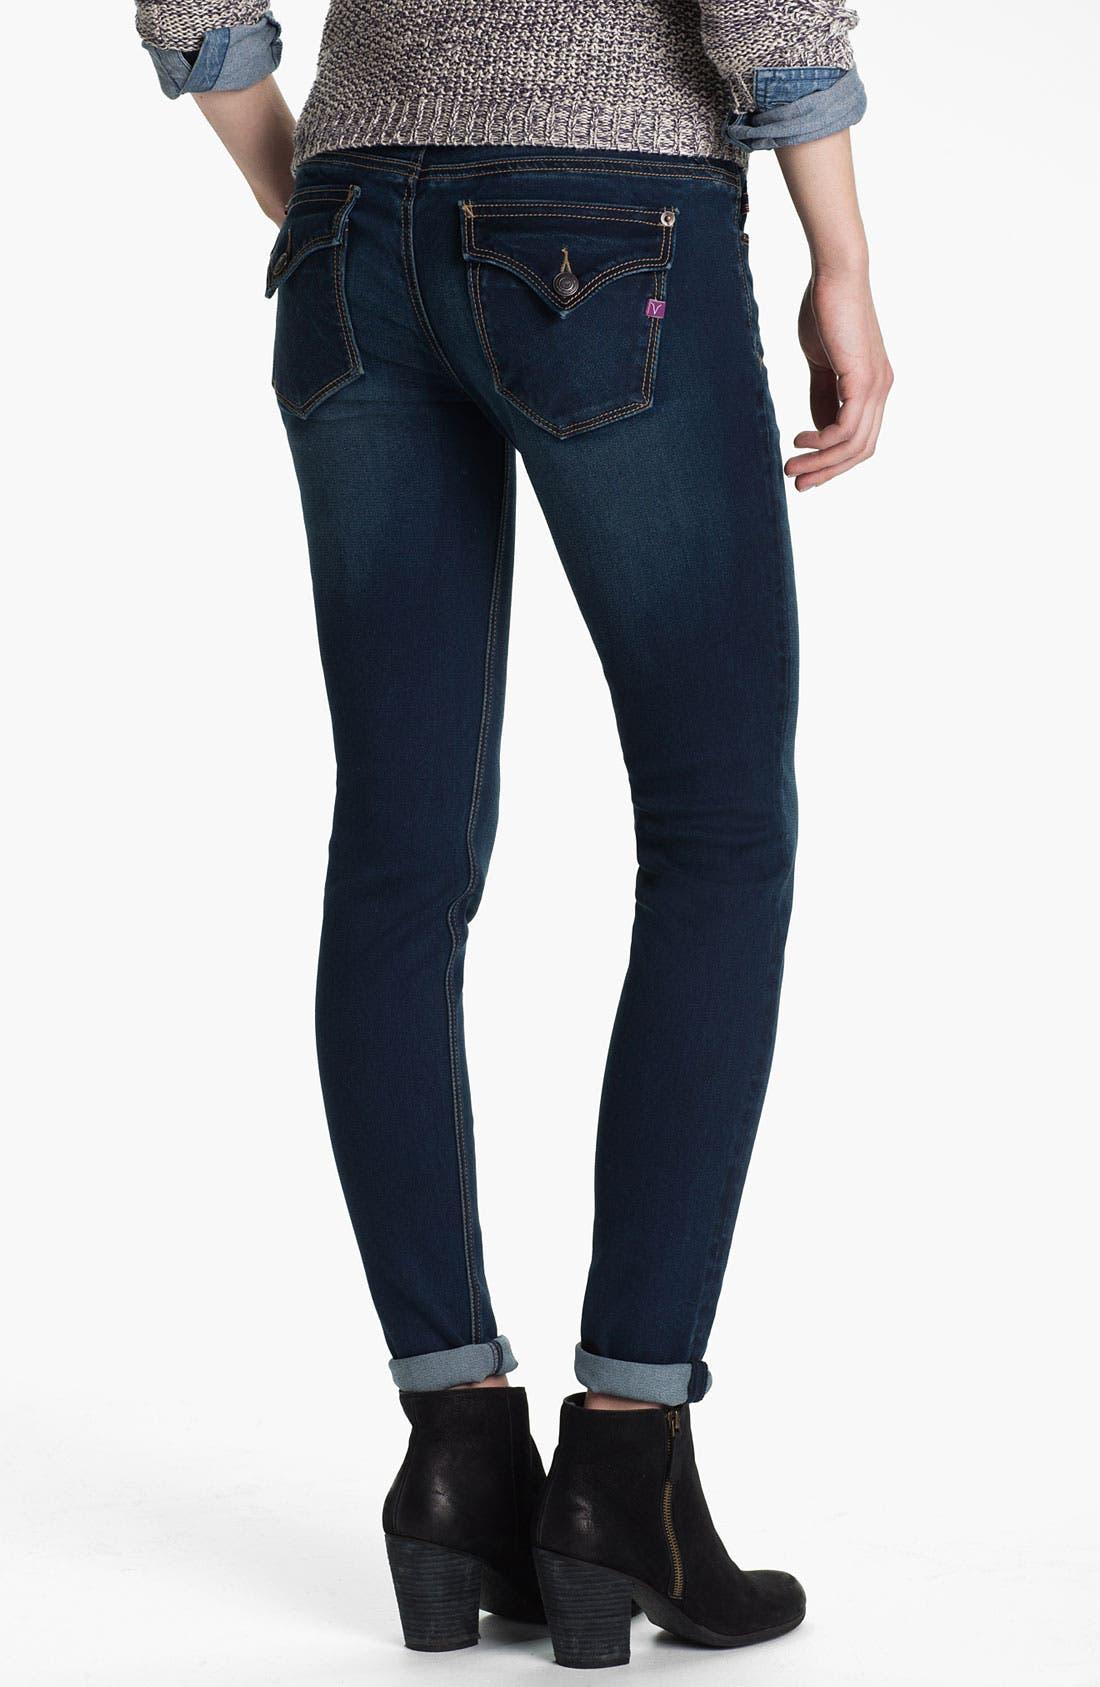 Alternate Image 1 Selected - Vigoss Flap Pocket Skinny Stretch Jeans (Juniors)